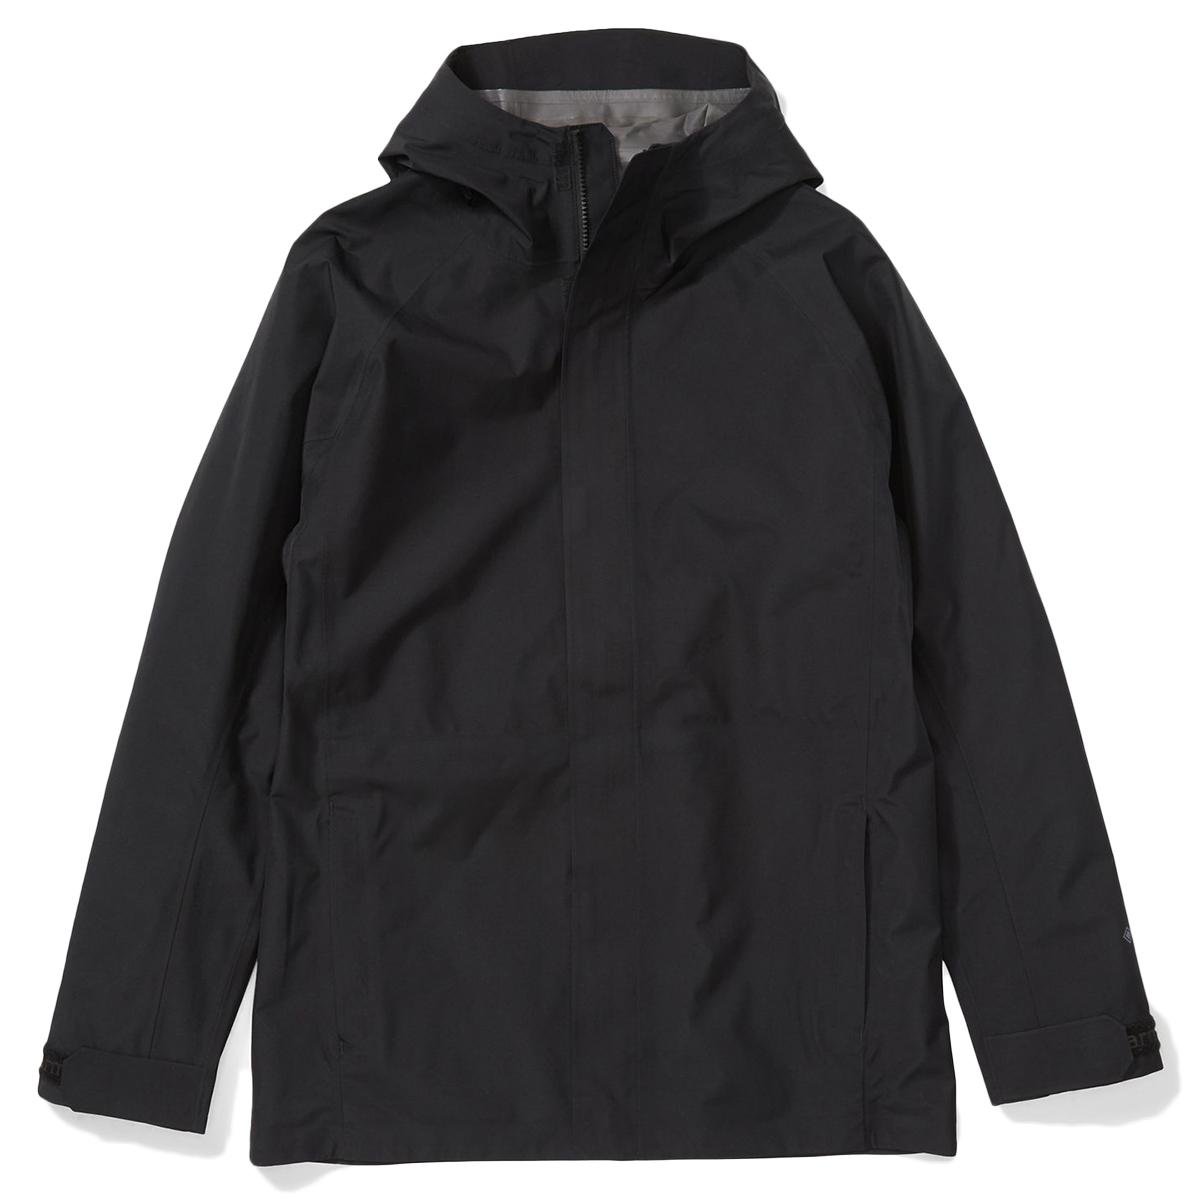 Marmot Men's Prescott Jacket - Black, M